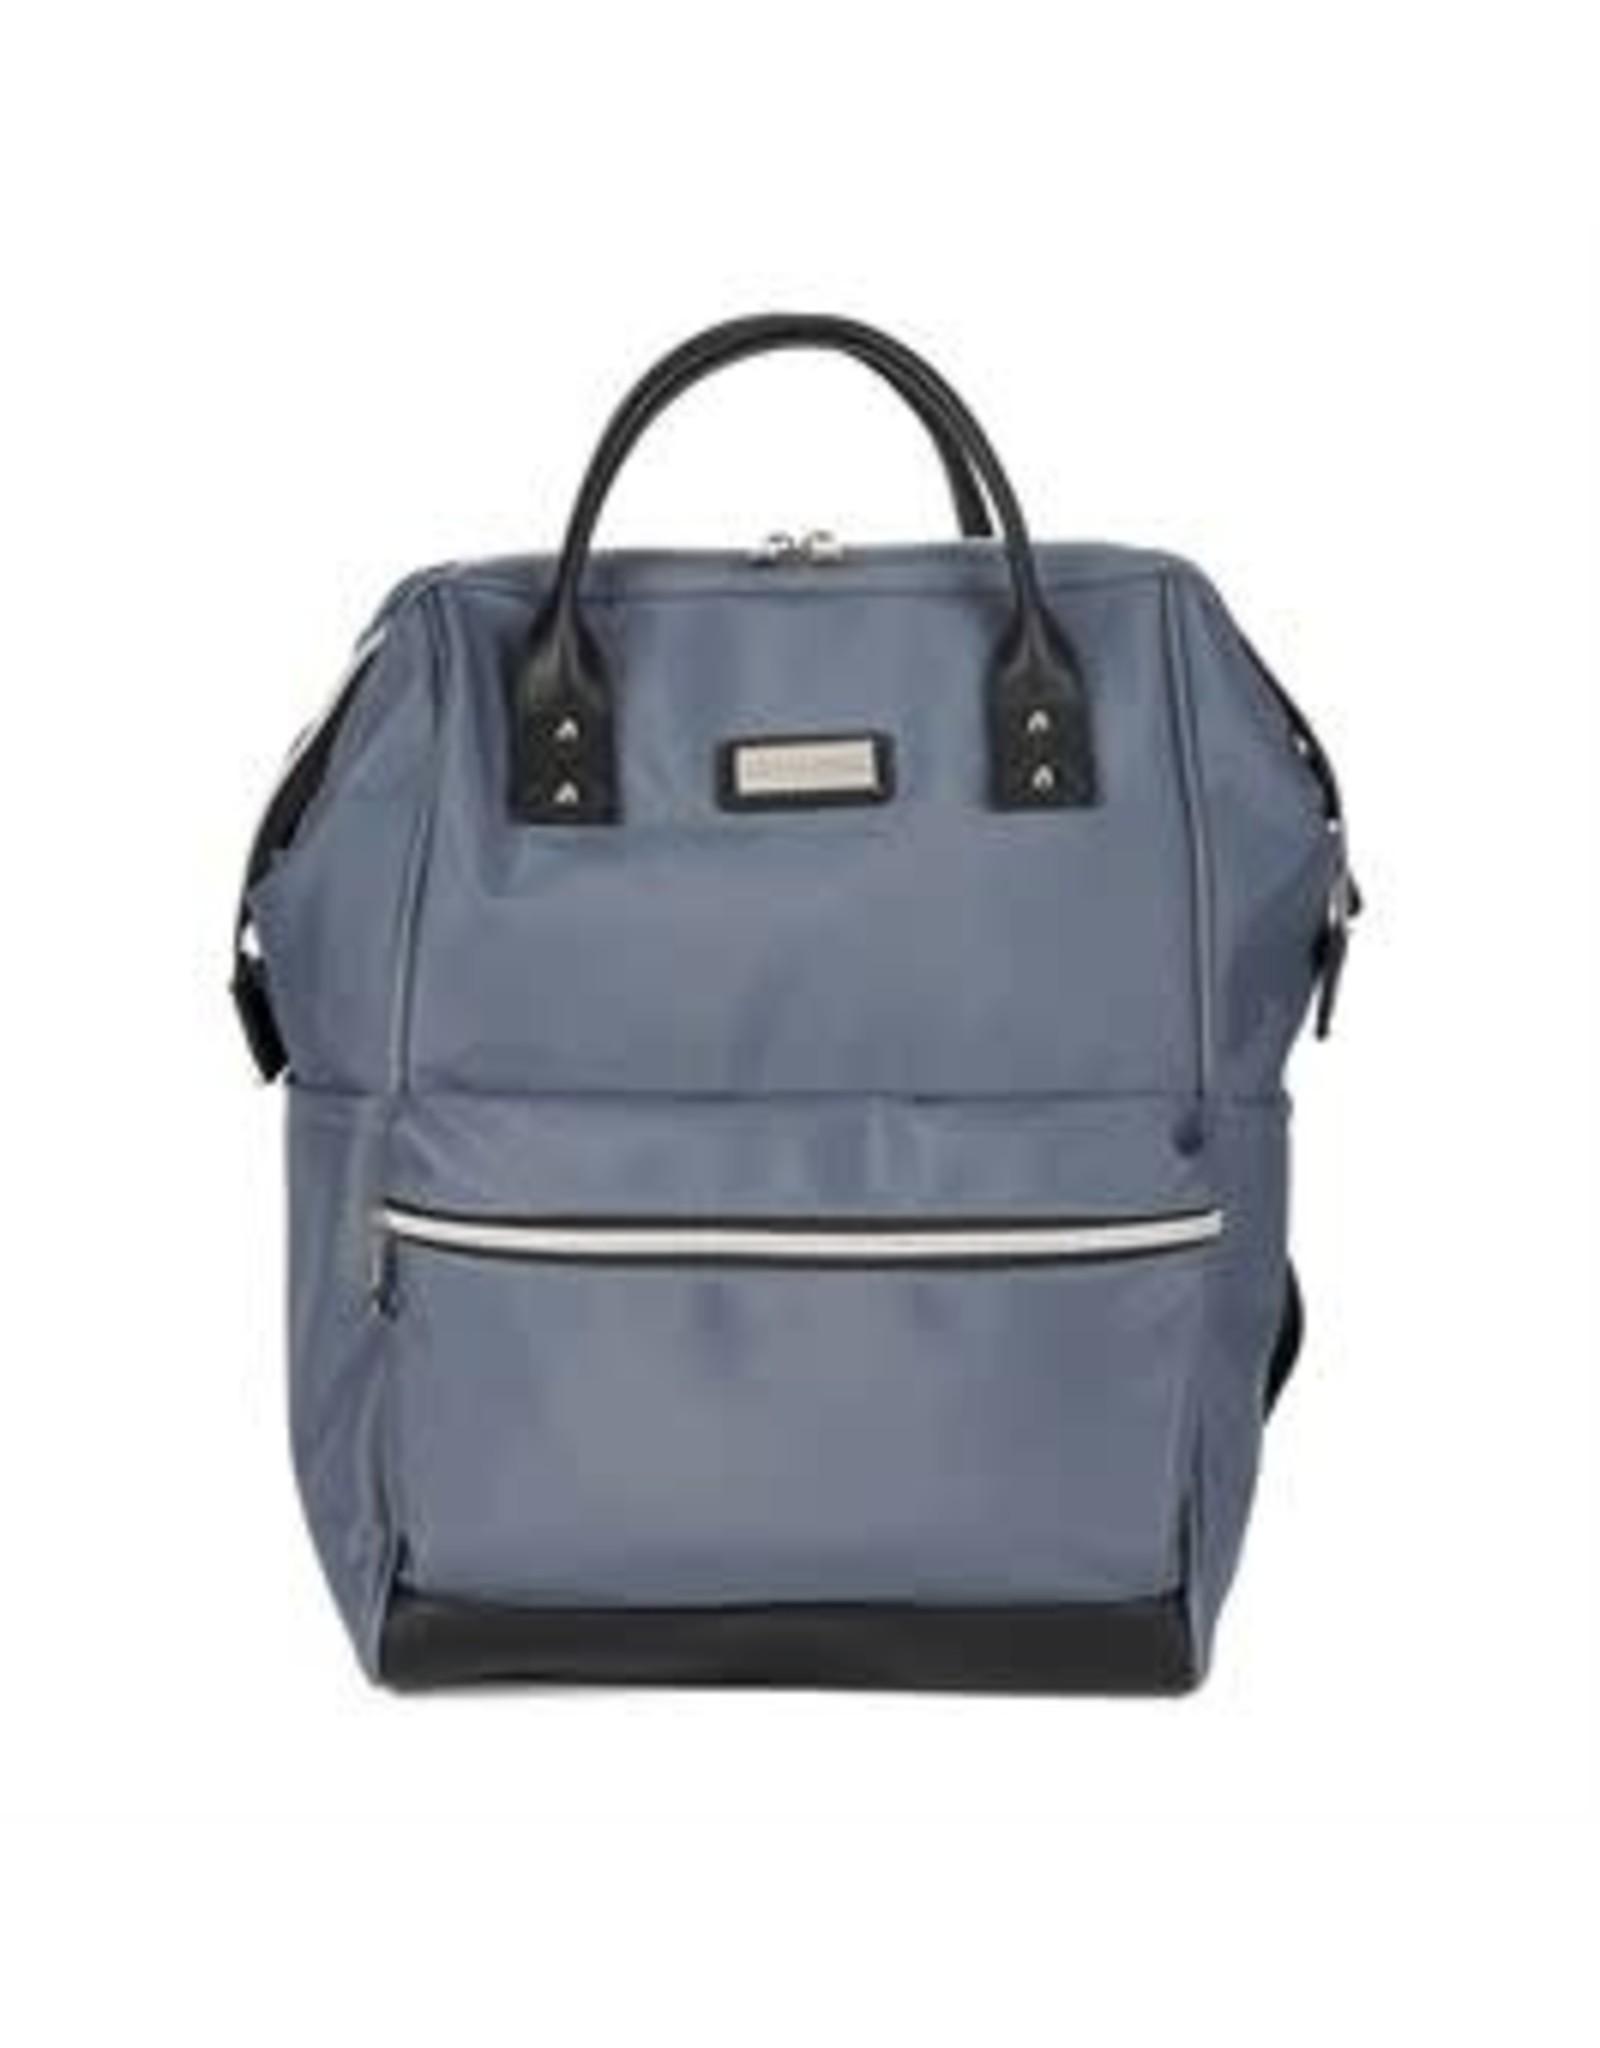 Coco & Carmen Ava Travel Grey Backpack